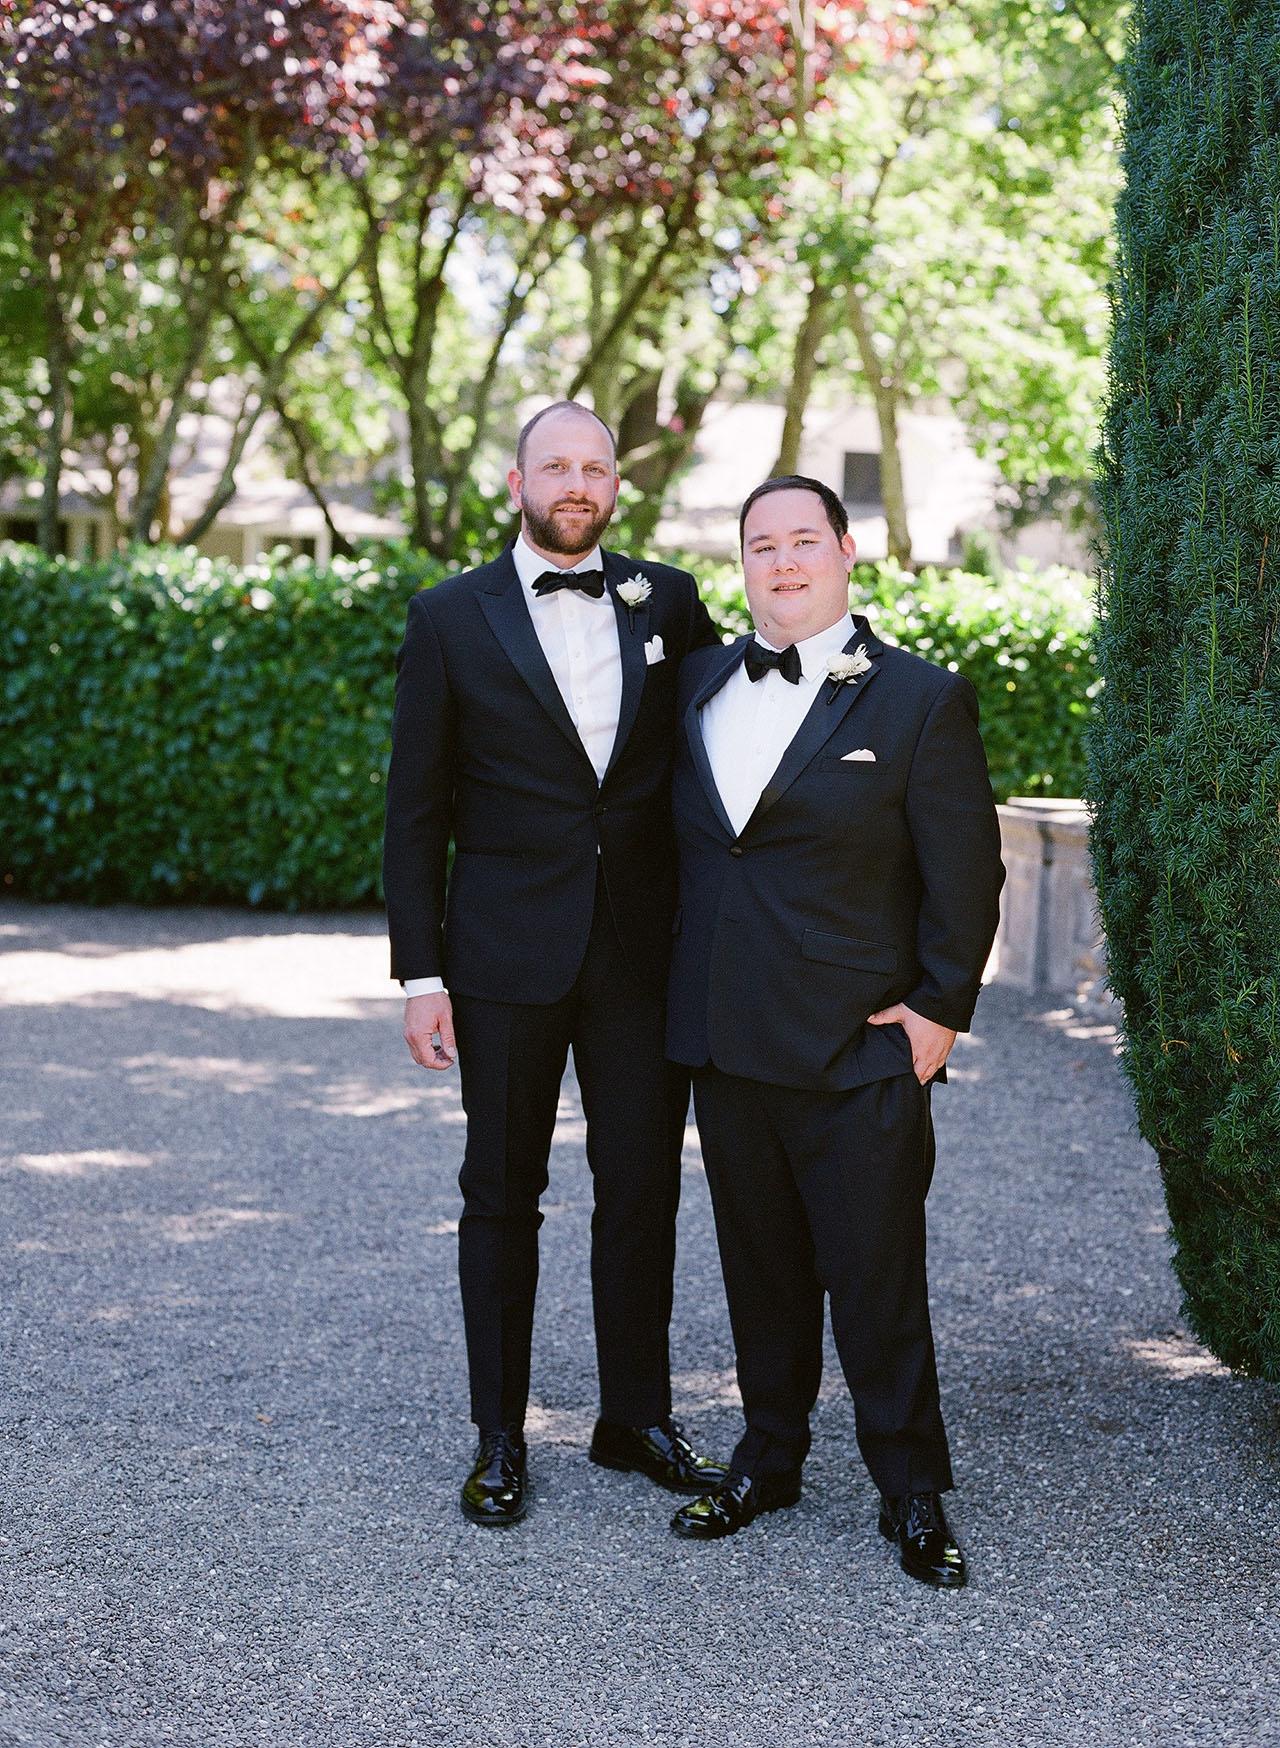 gillian tyler wedding groom groomsmen